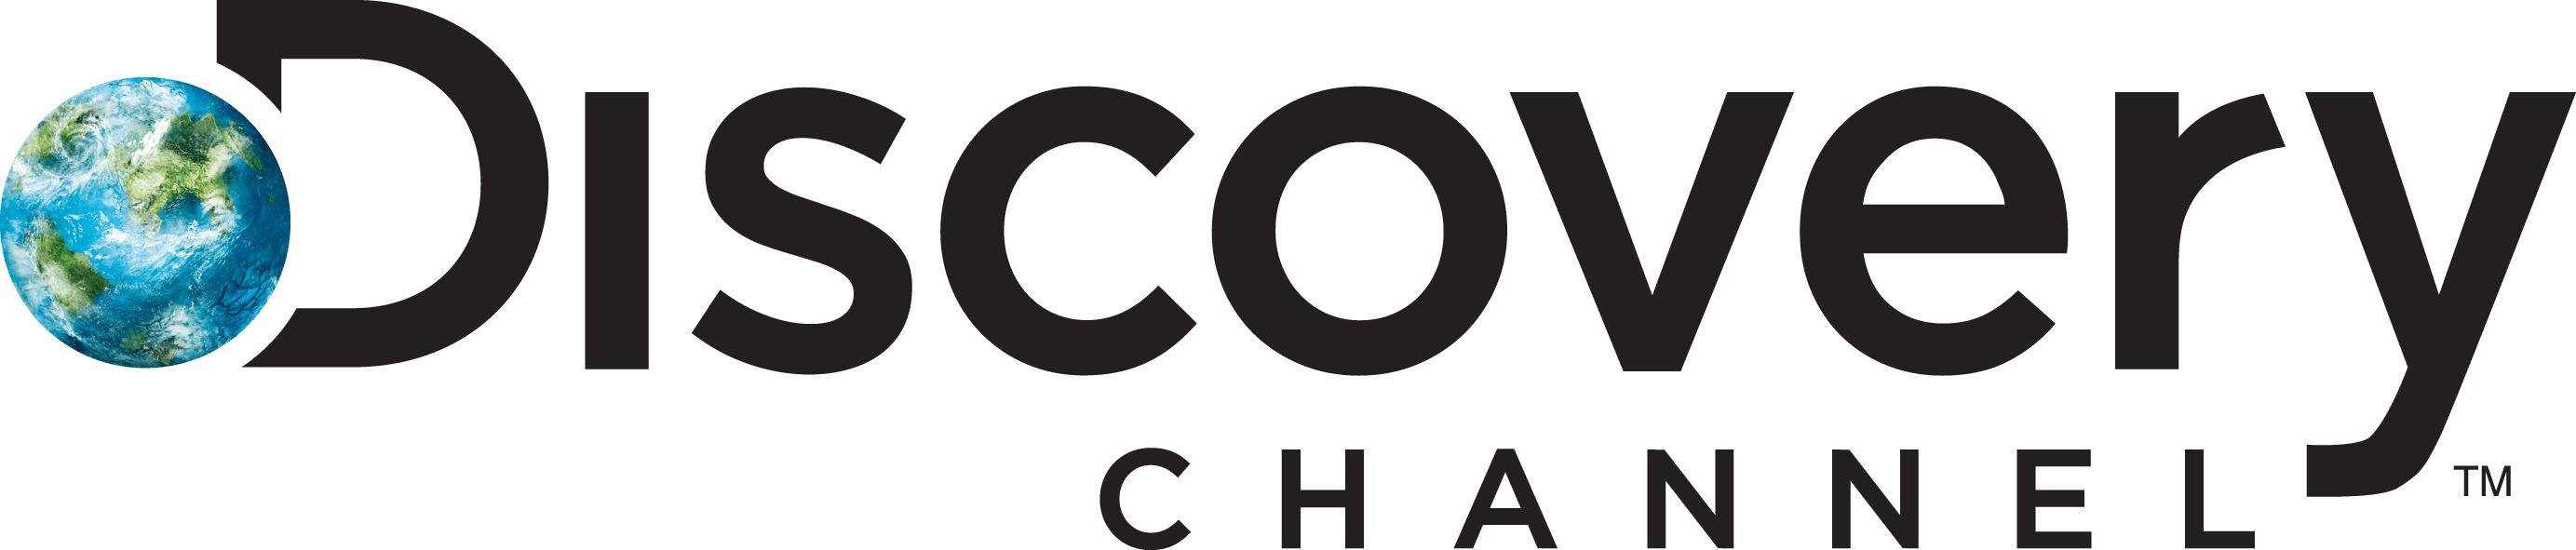 Discovery-logó